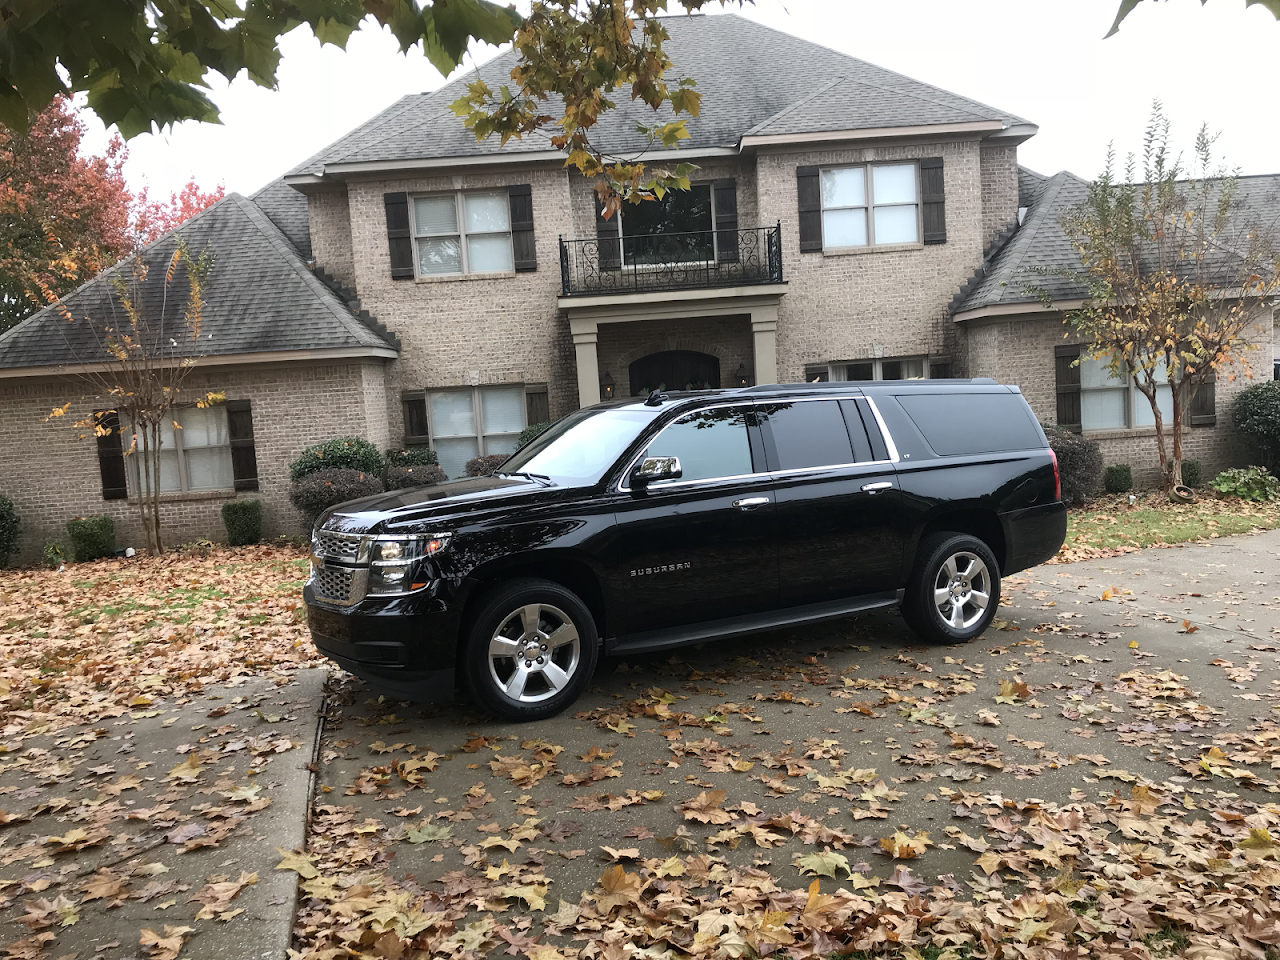 Prestige Limo Service - Limousine Service in Tuscaloosa